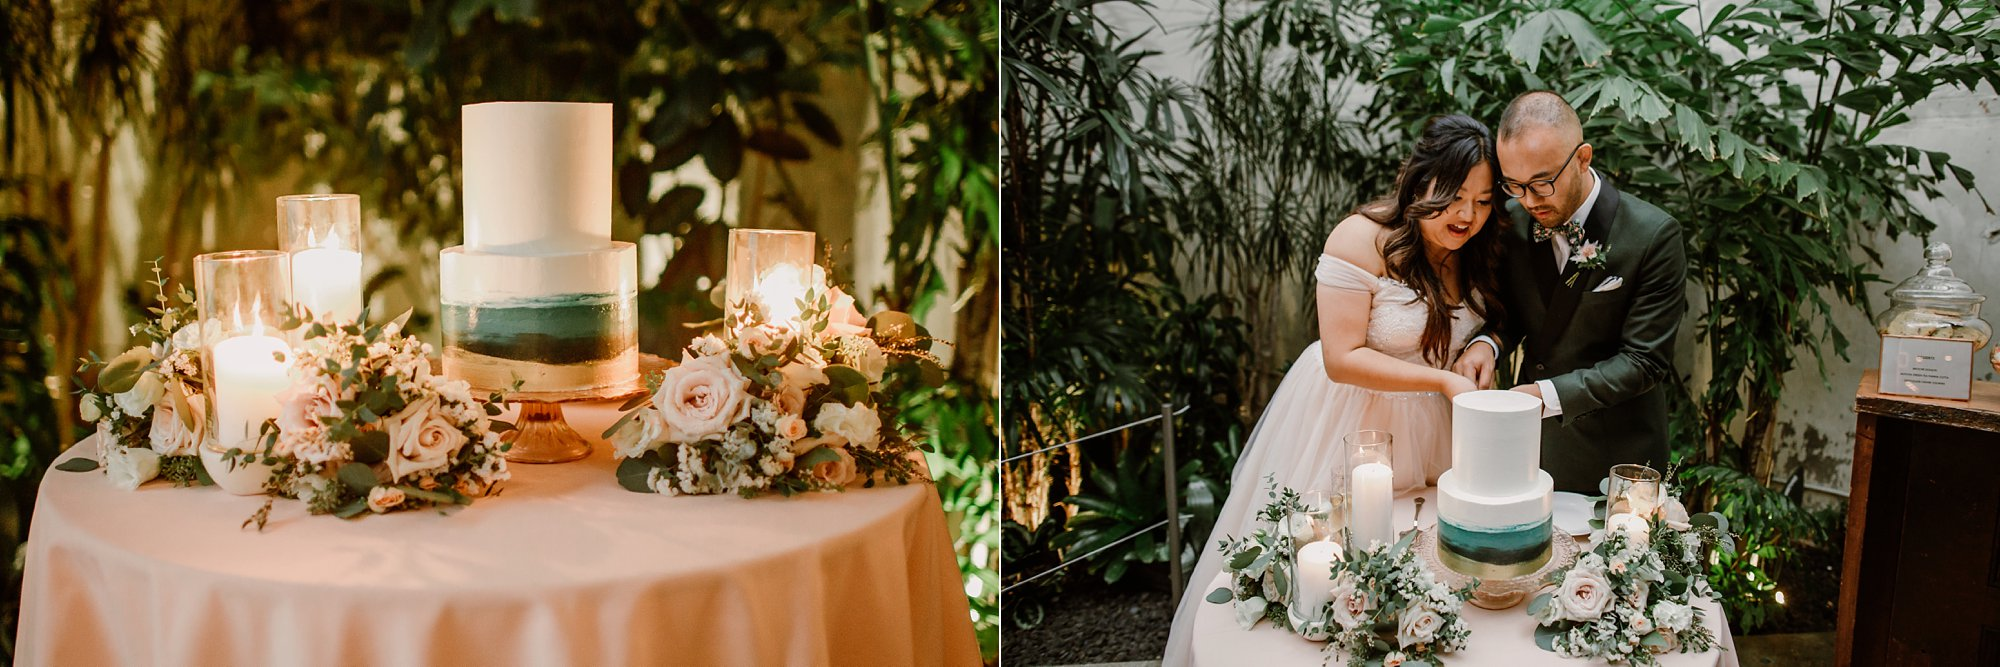 Millwick Los Angeles California Wedding_0080.jpg